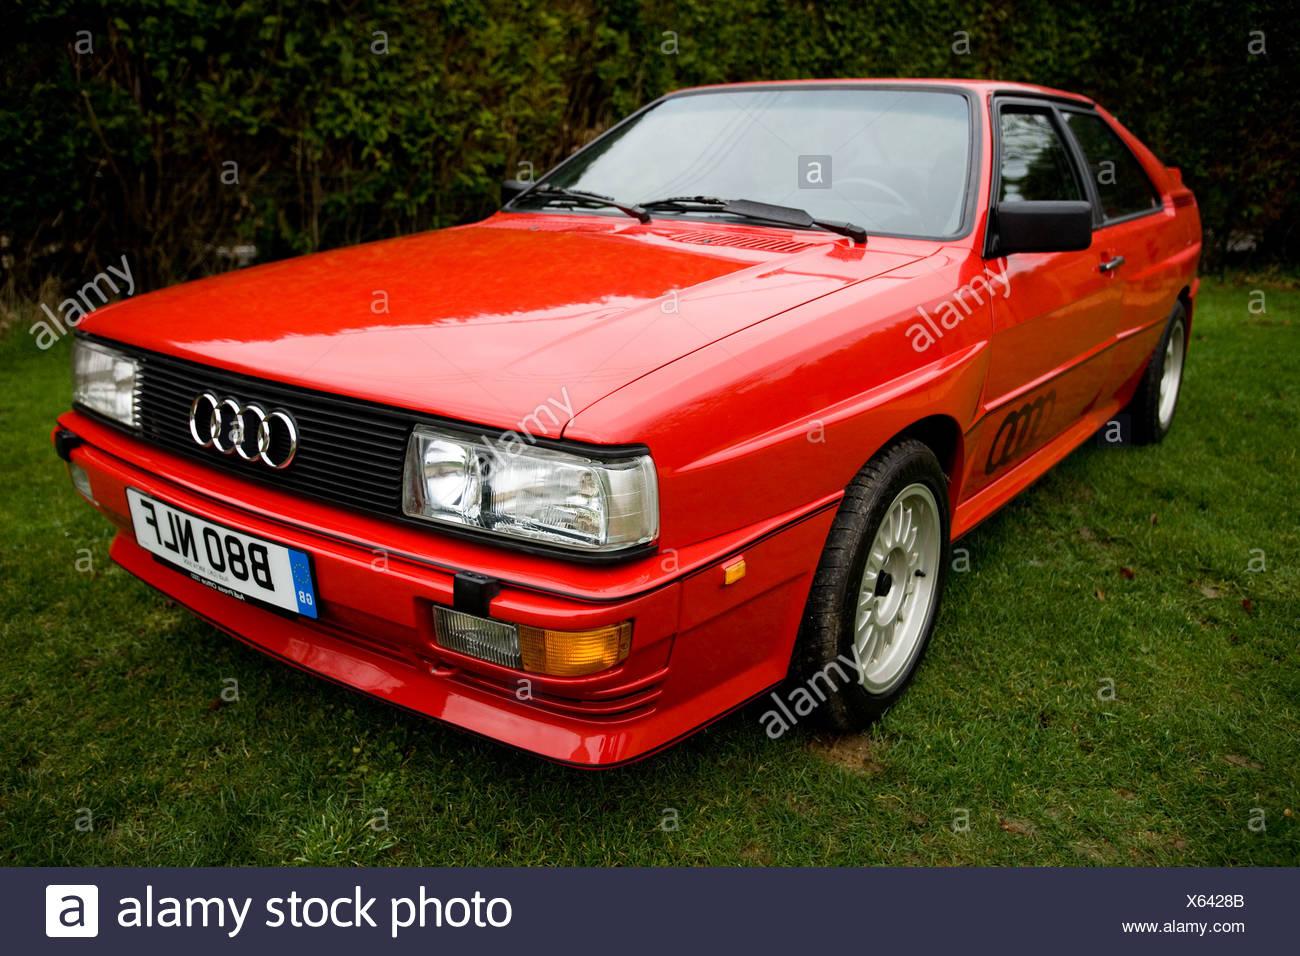 THE 80'S AUDI QUATTRO IN RED - Stock Image